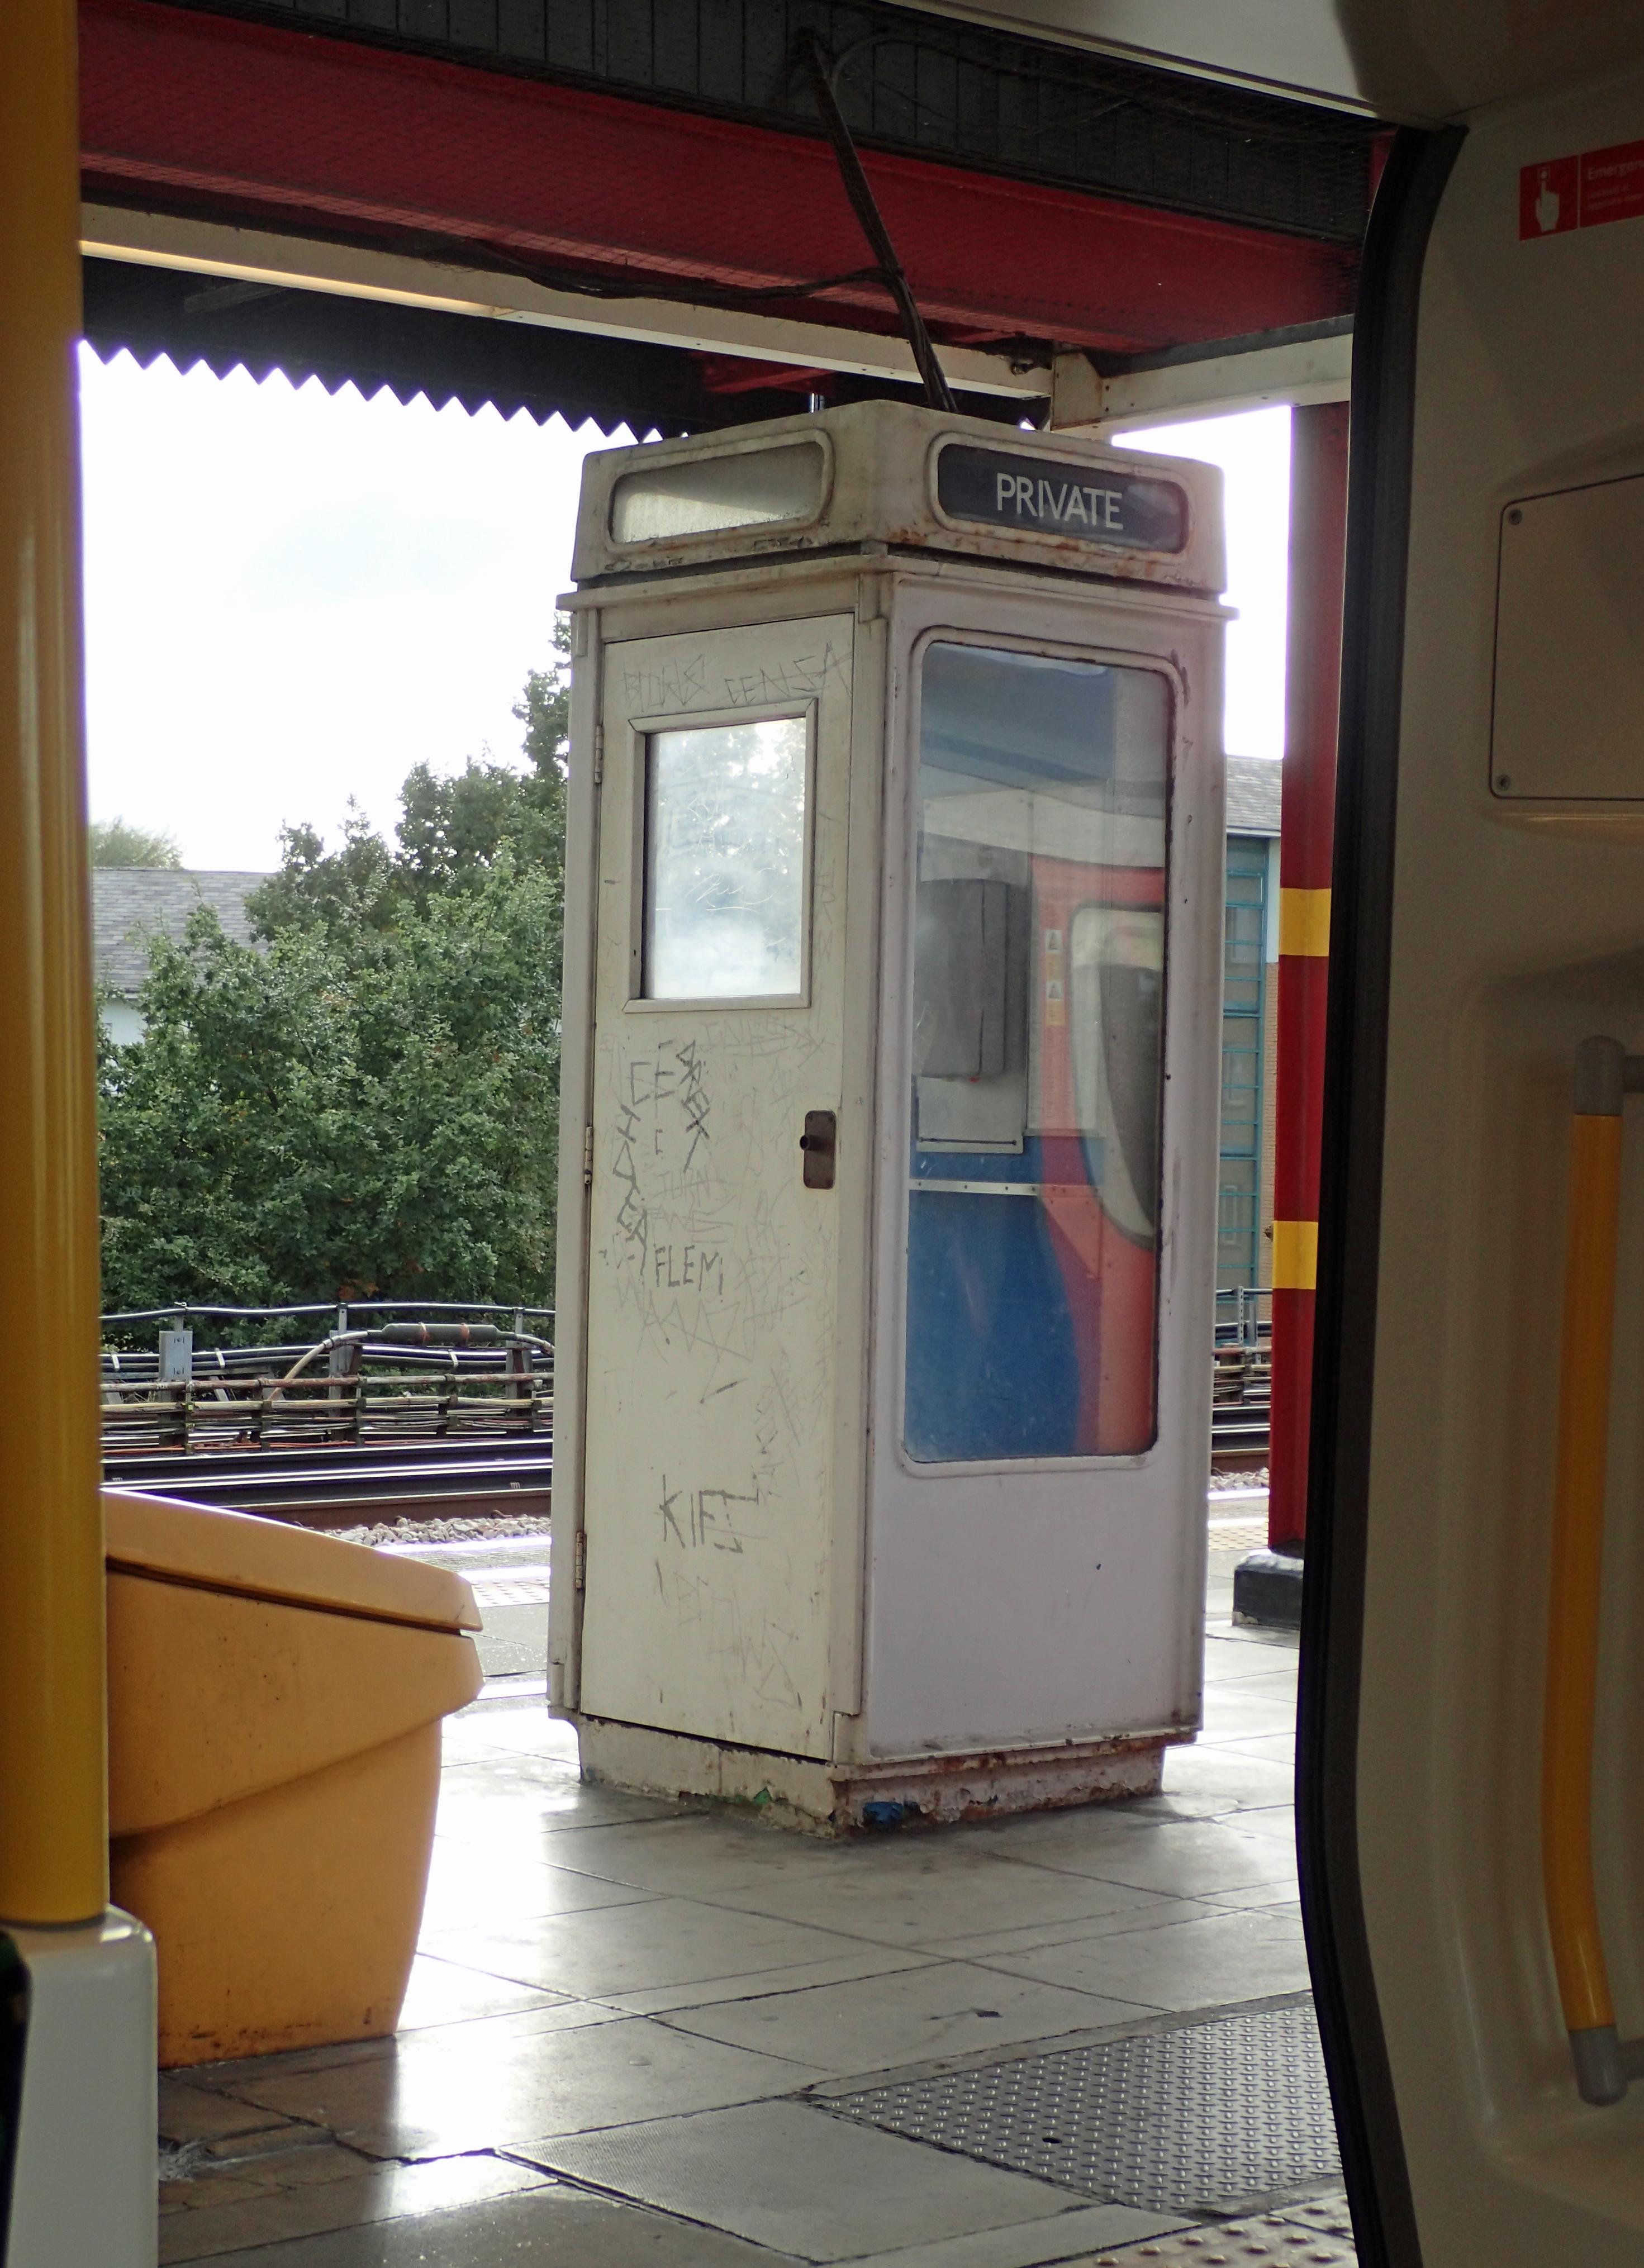 K8 seen at Northwick Park, Metropolitan Line, en route to the London Countryway